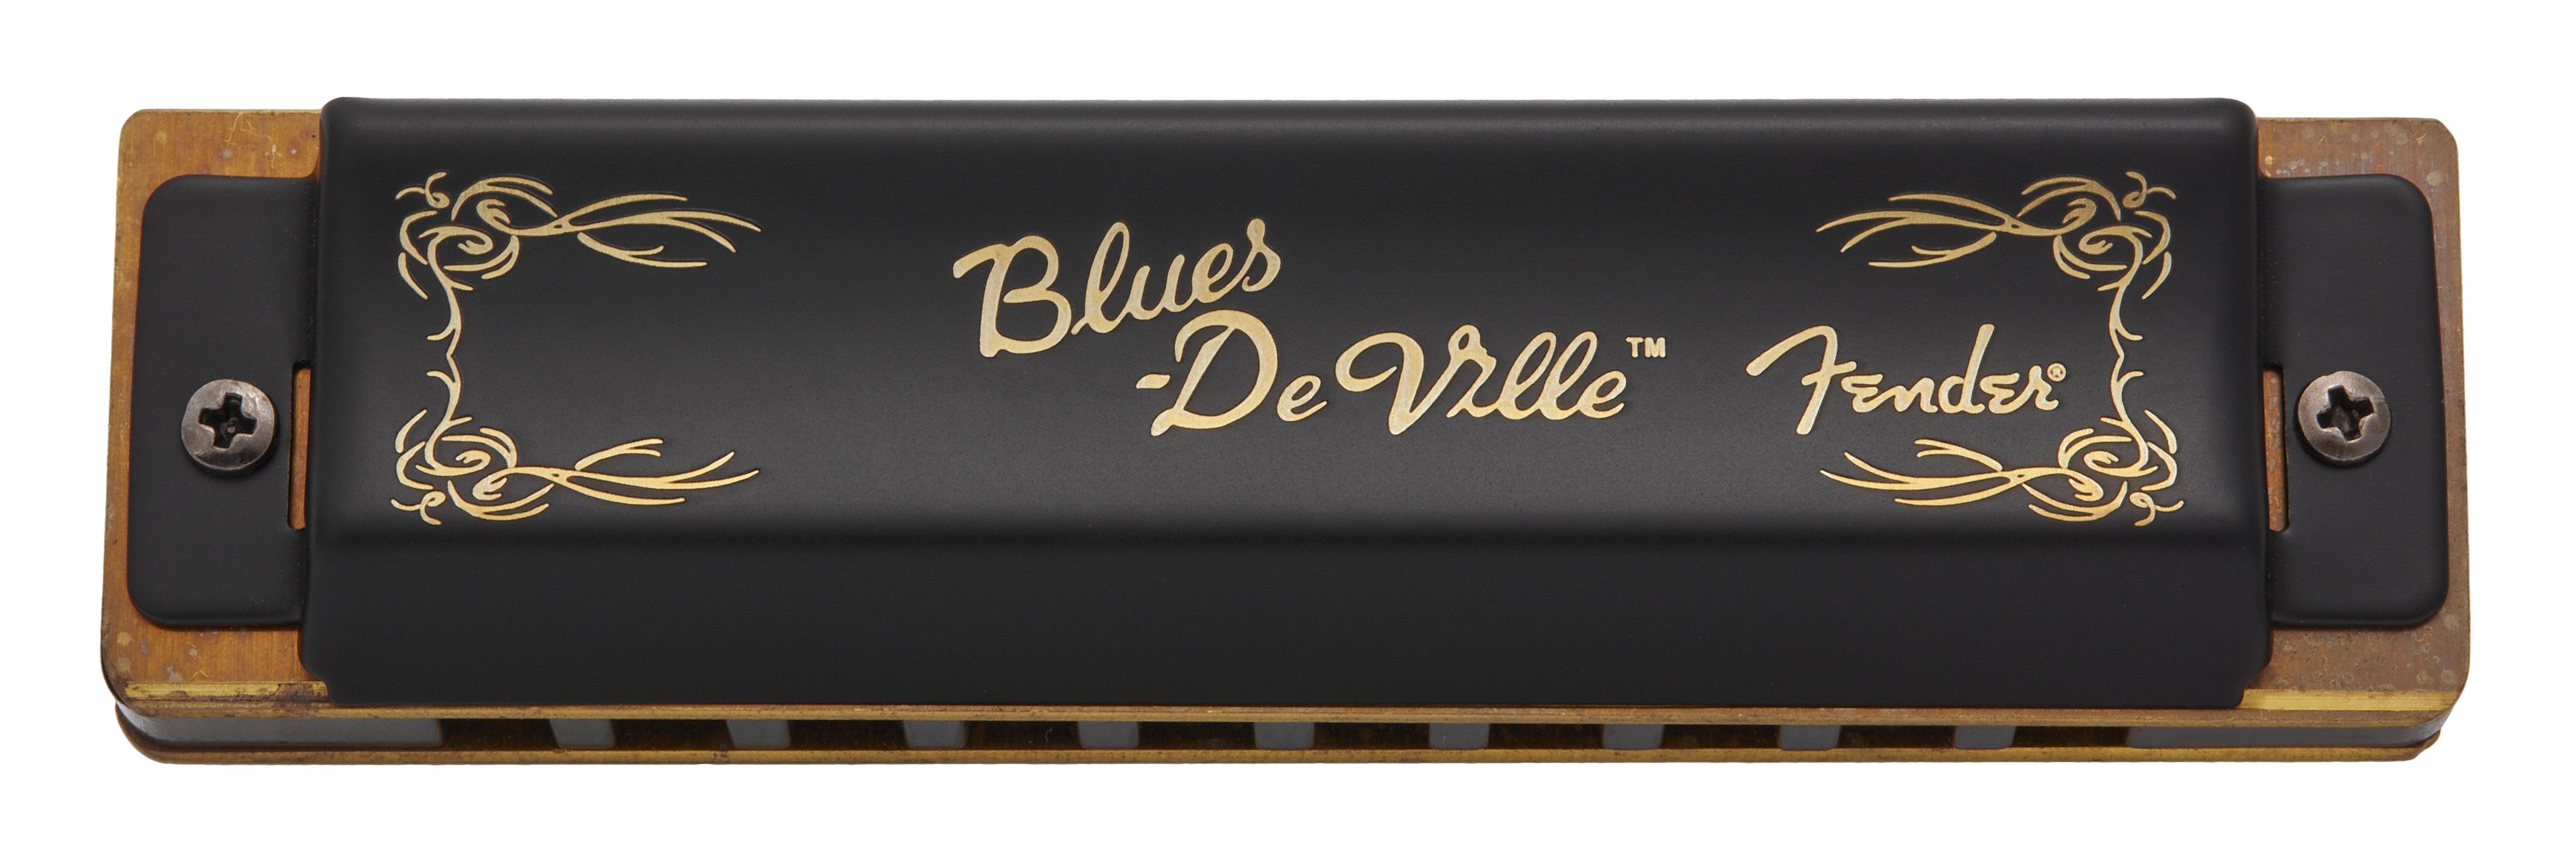 Fender Blues DeVille Key of E